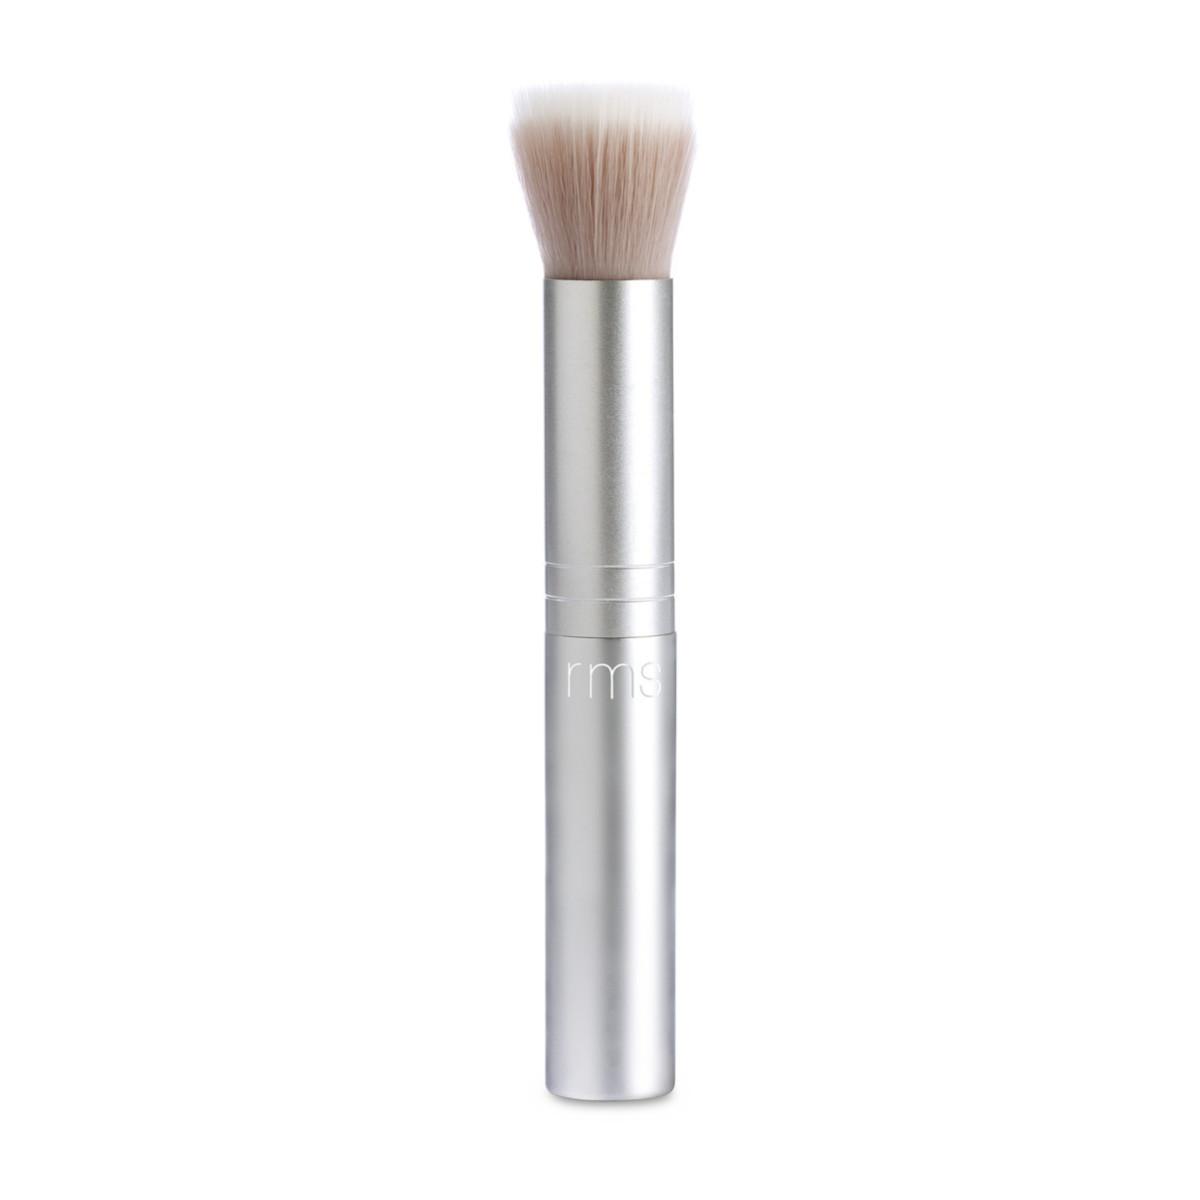 RMS Beauty Skin2Skin Blush Brush